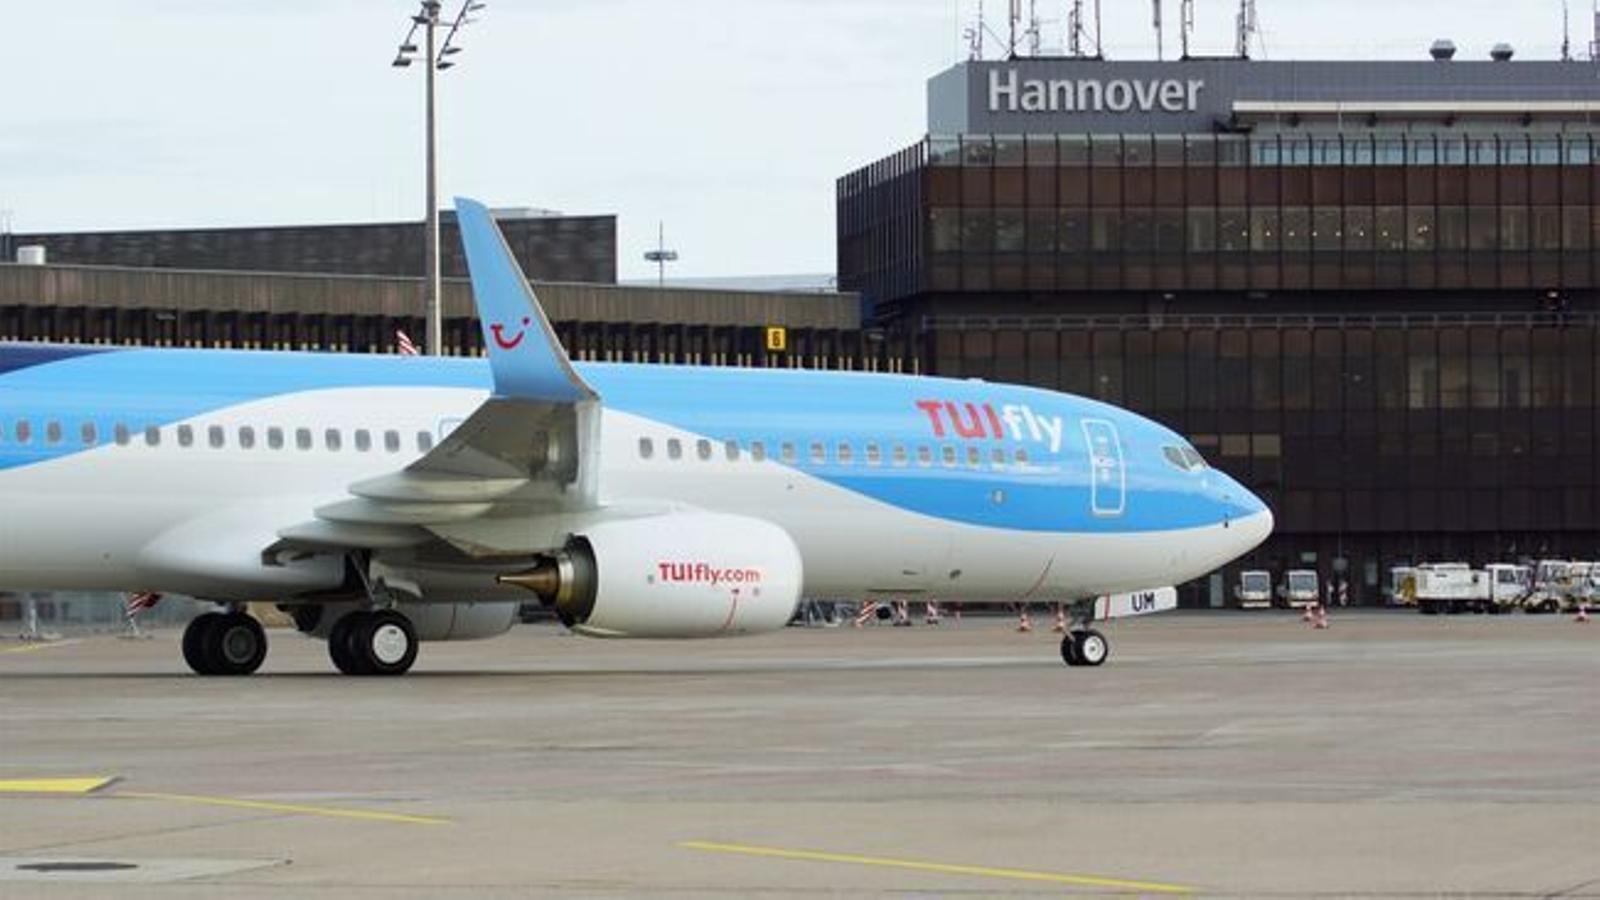 Un avió de TUI-Fly.